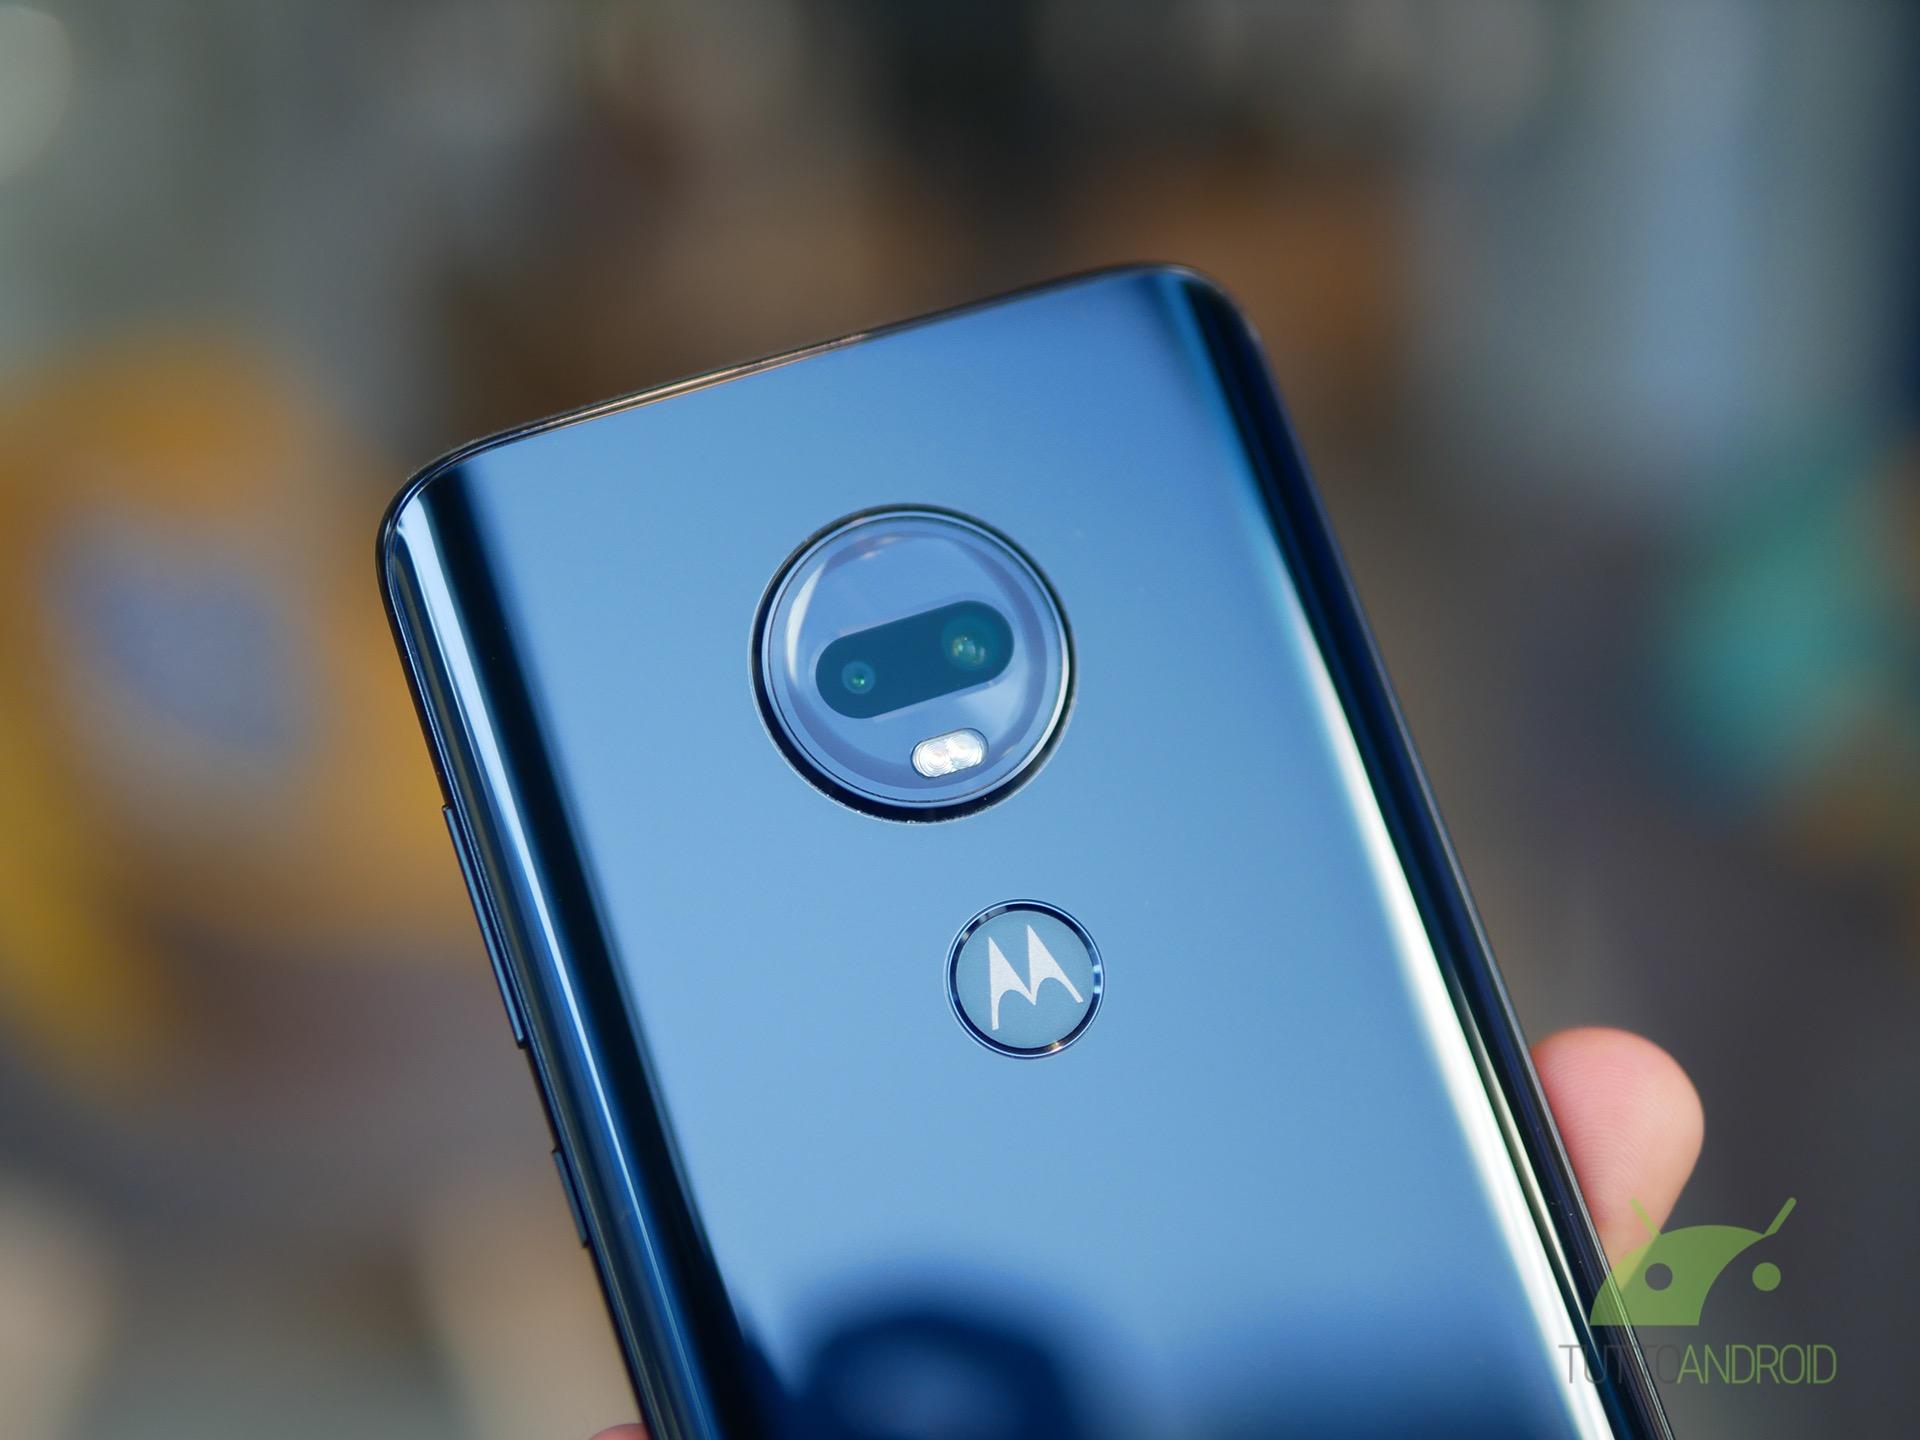 ee52501320b Motorola al lavoro sulla visione notturna per Motorola One Vision e Moto G7  Plus